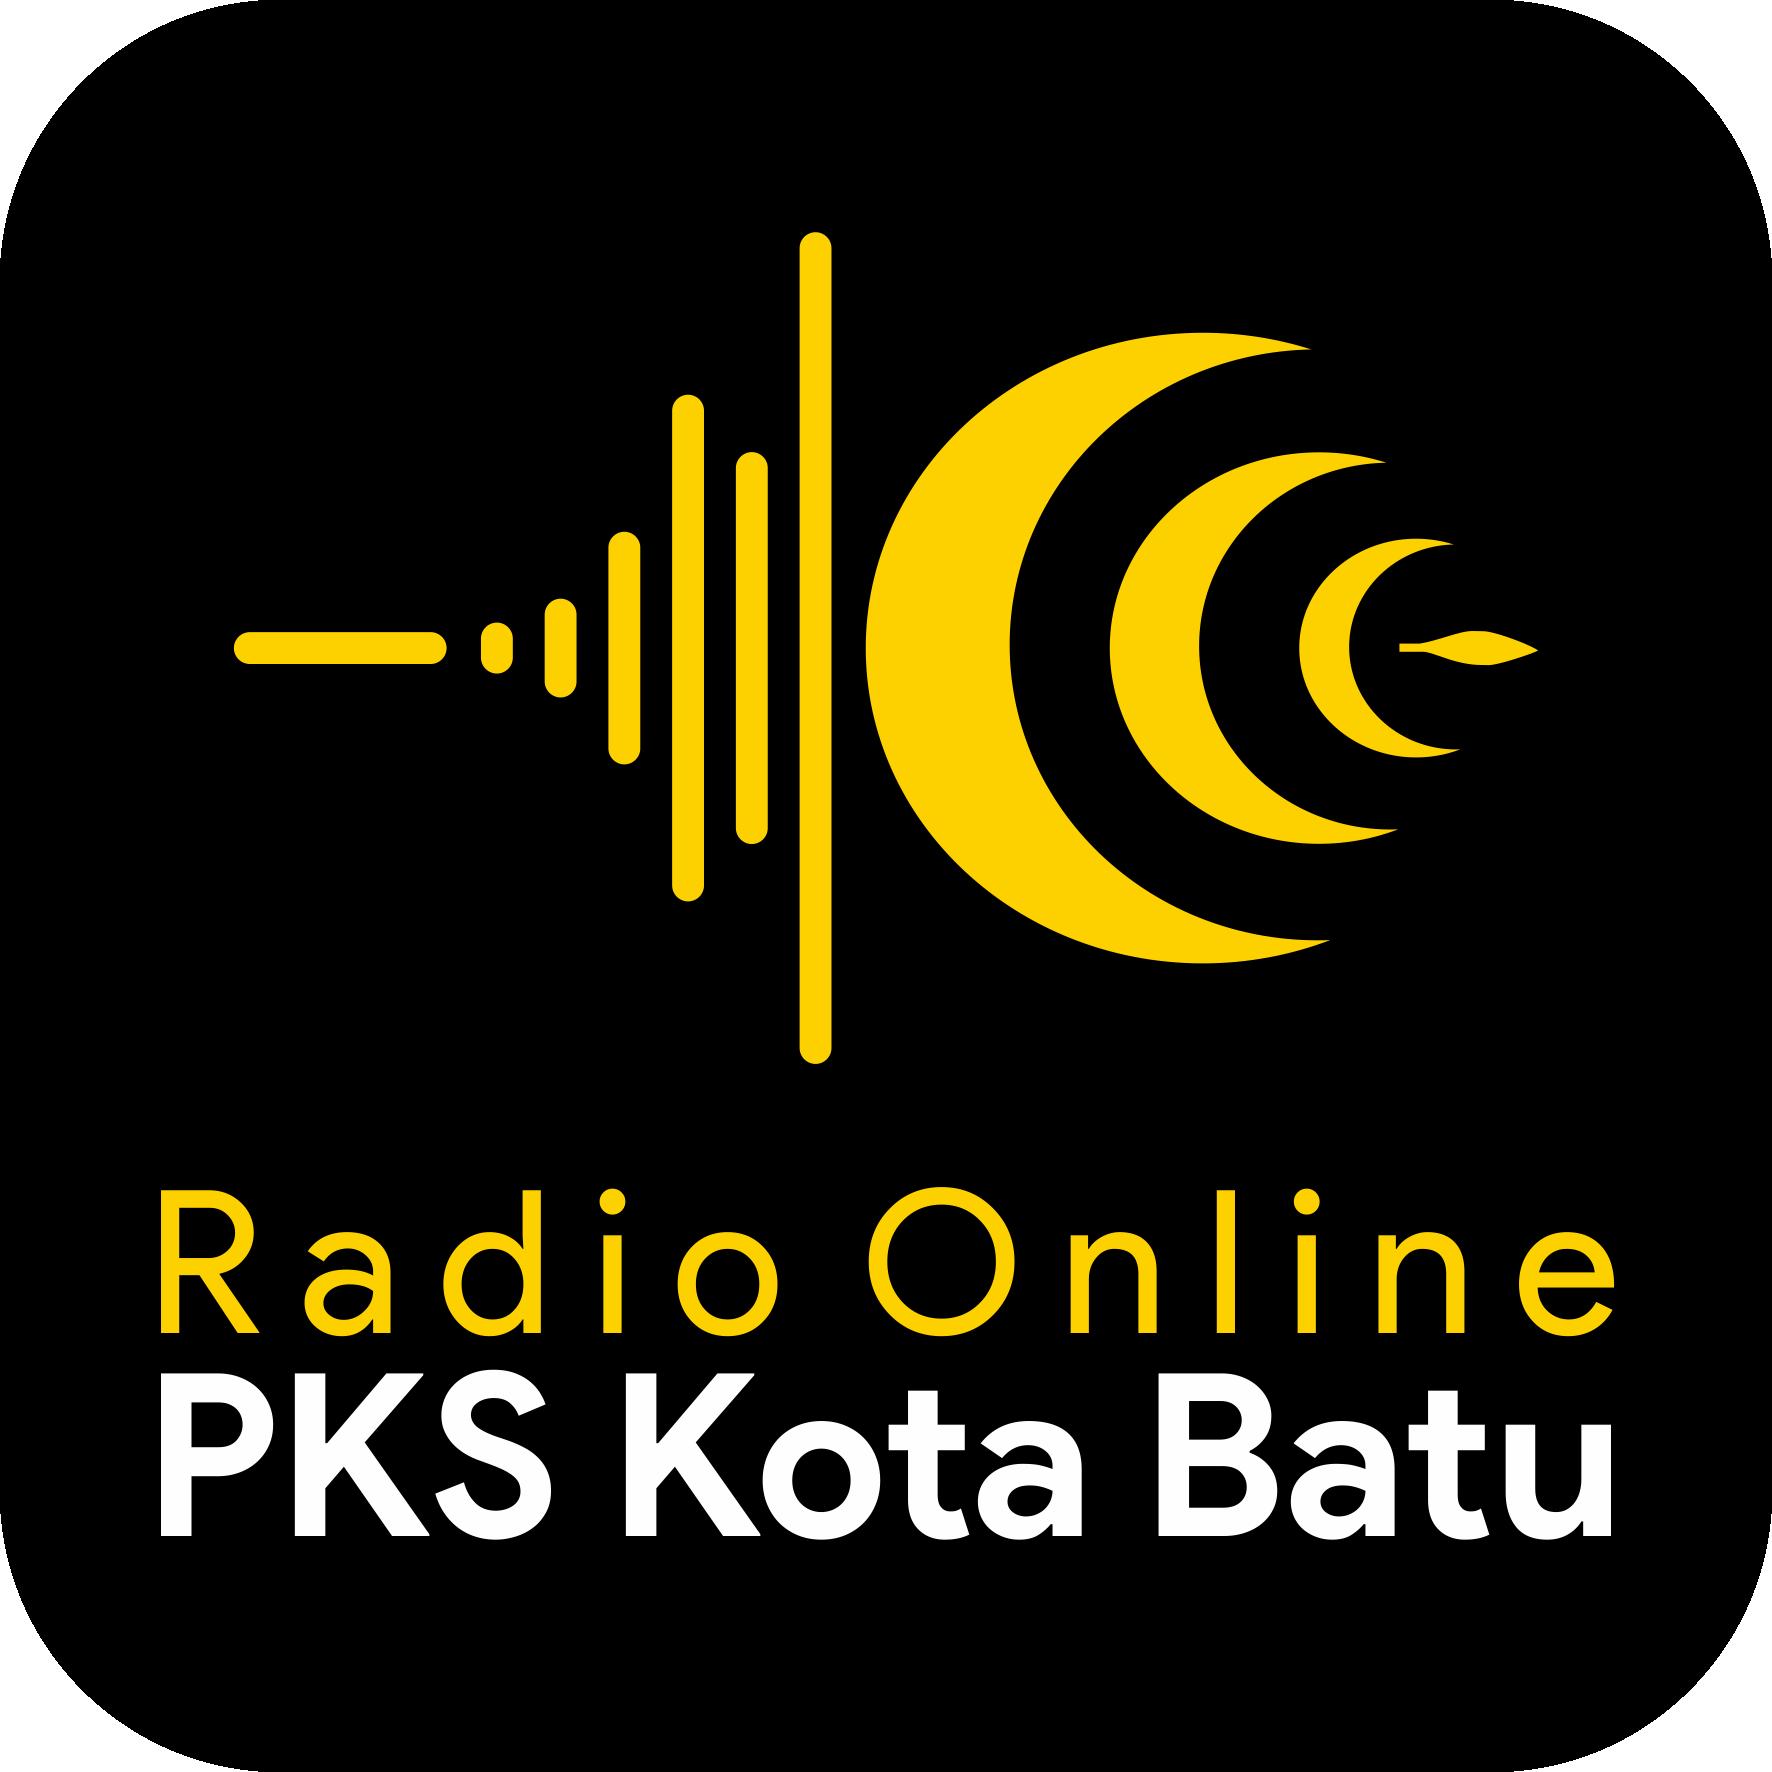 Radio Online PKS Kota Batu